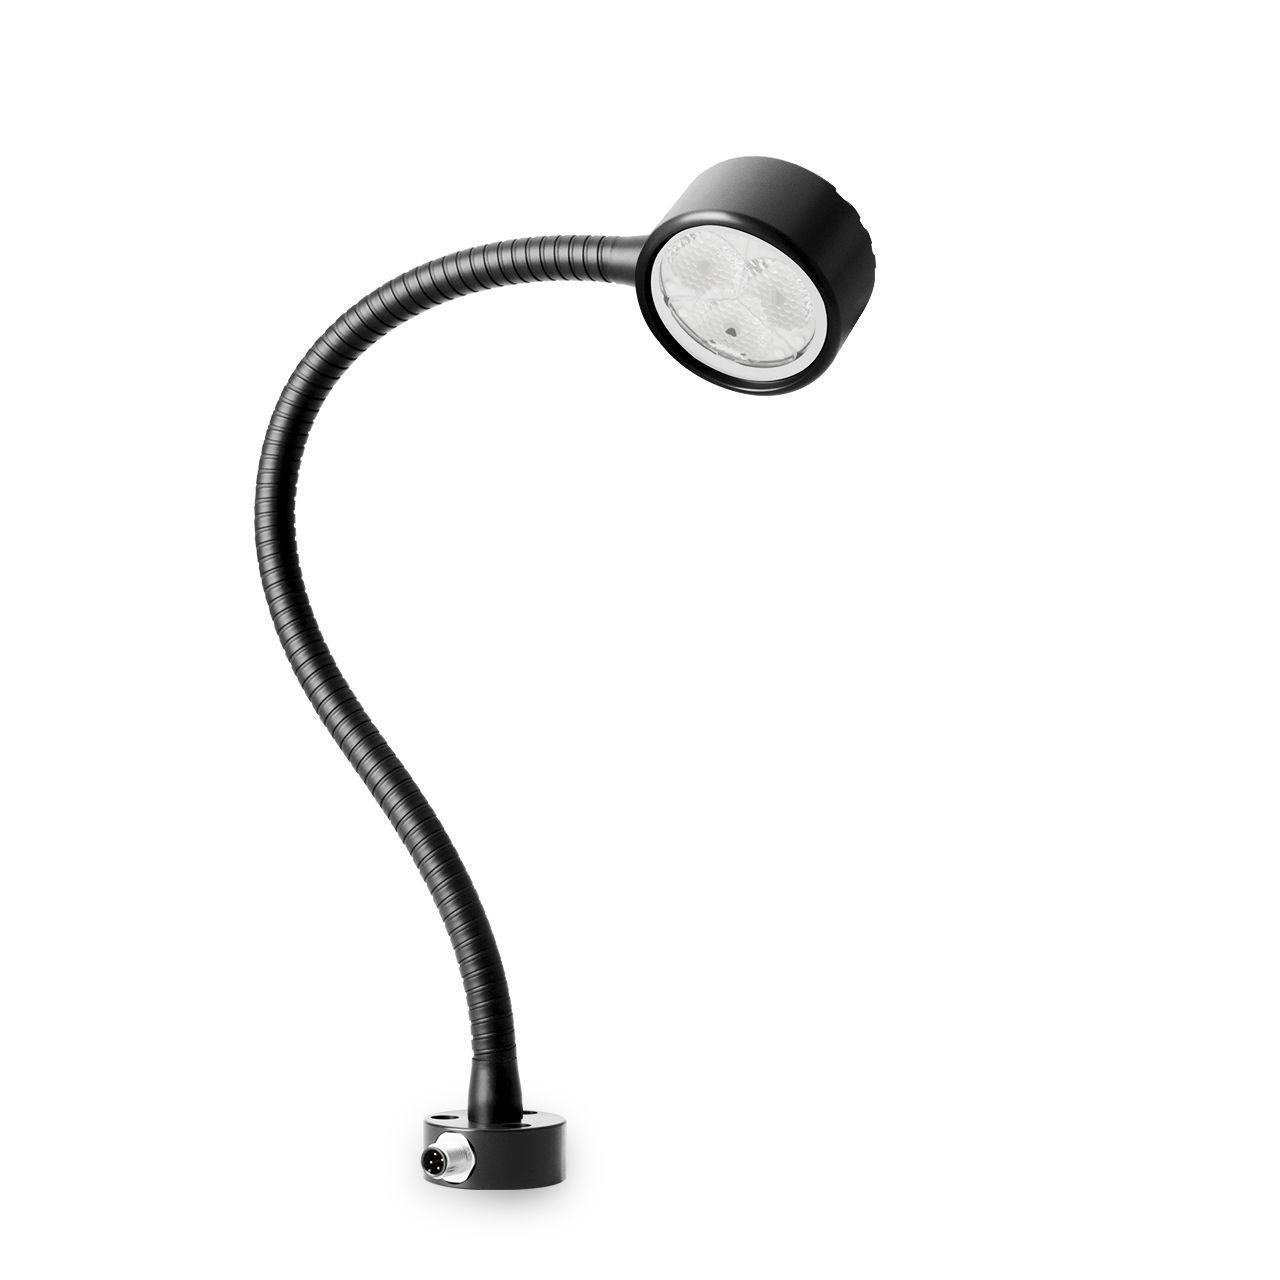 Lampe A Led Pour Machine Outil D65g S Series Diana